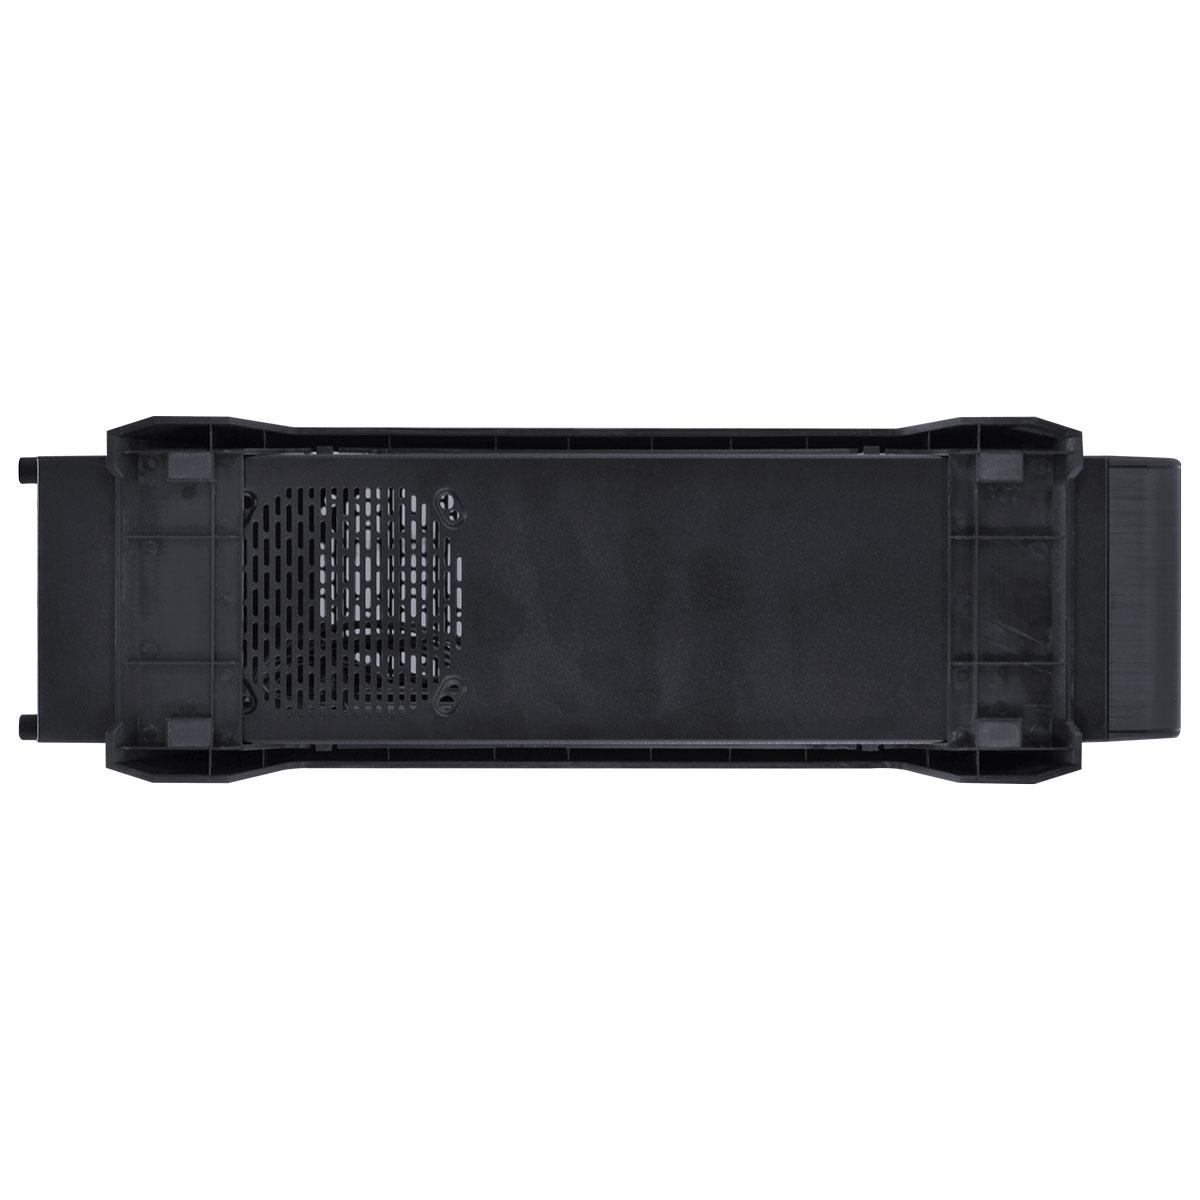 COMPUTADOR IRON PENTIUM G5400 3.7GHZ 8ª GER. MEM. 4GB DDR4 SSD 120GB HDMI/VGA GABINETE SLIM FONTE 275W LINUX